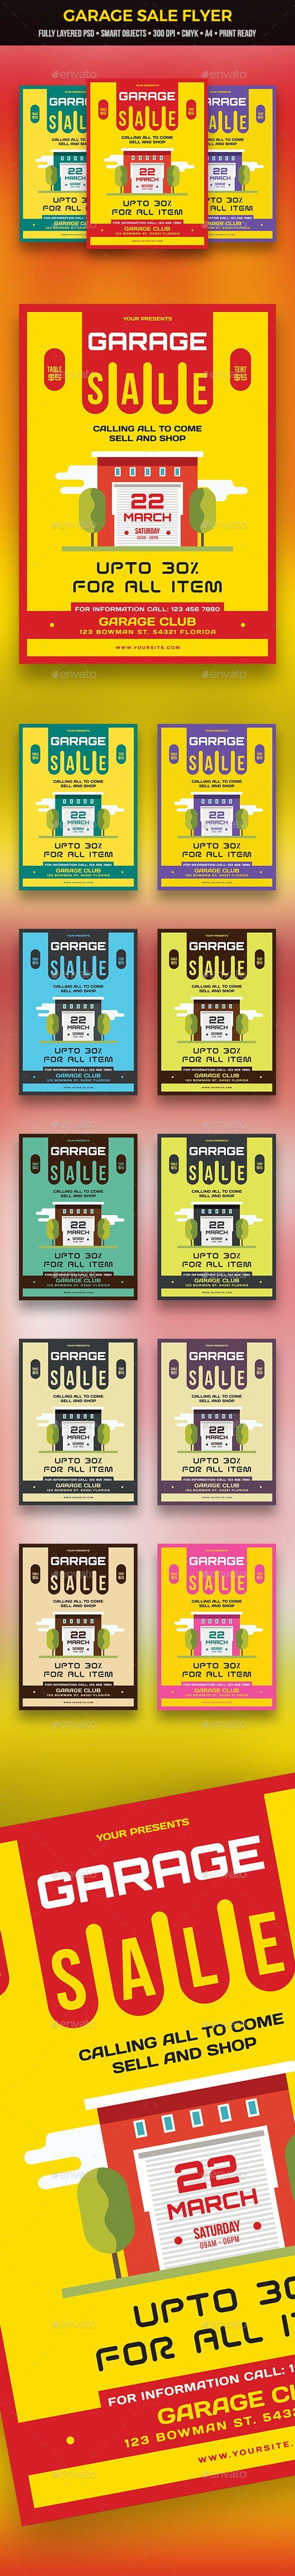 garage sale flyer commerce flyers